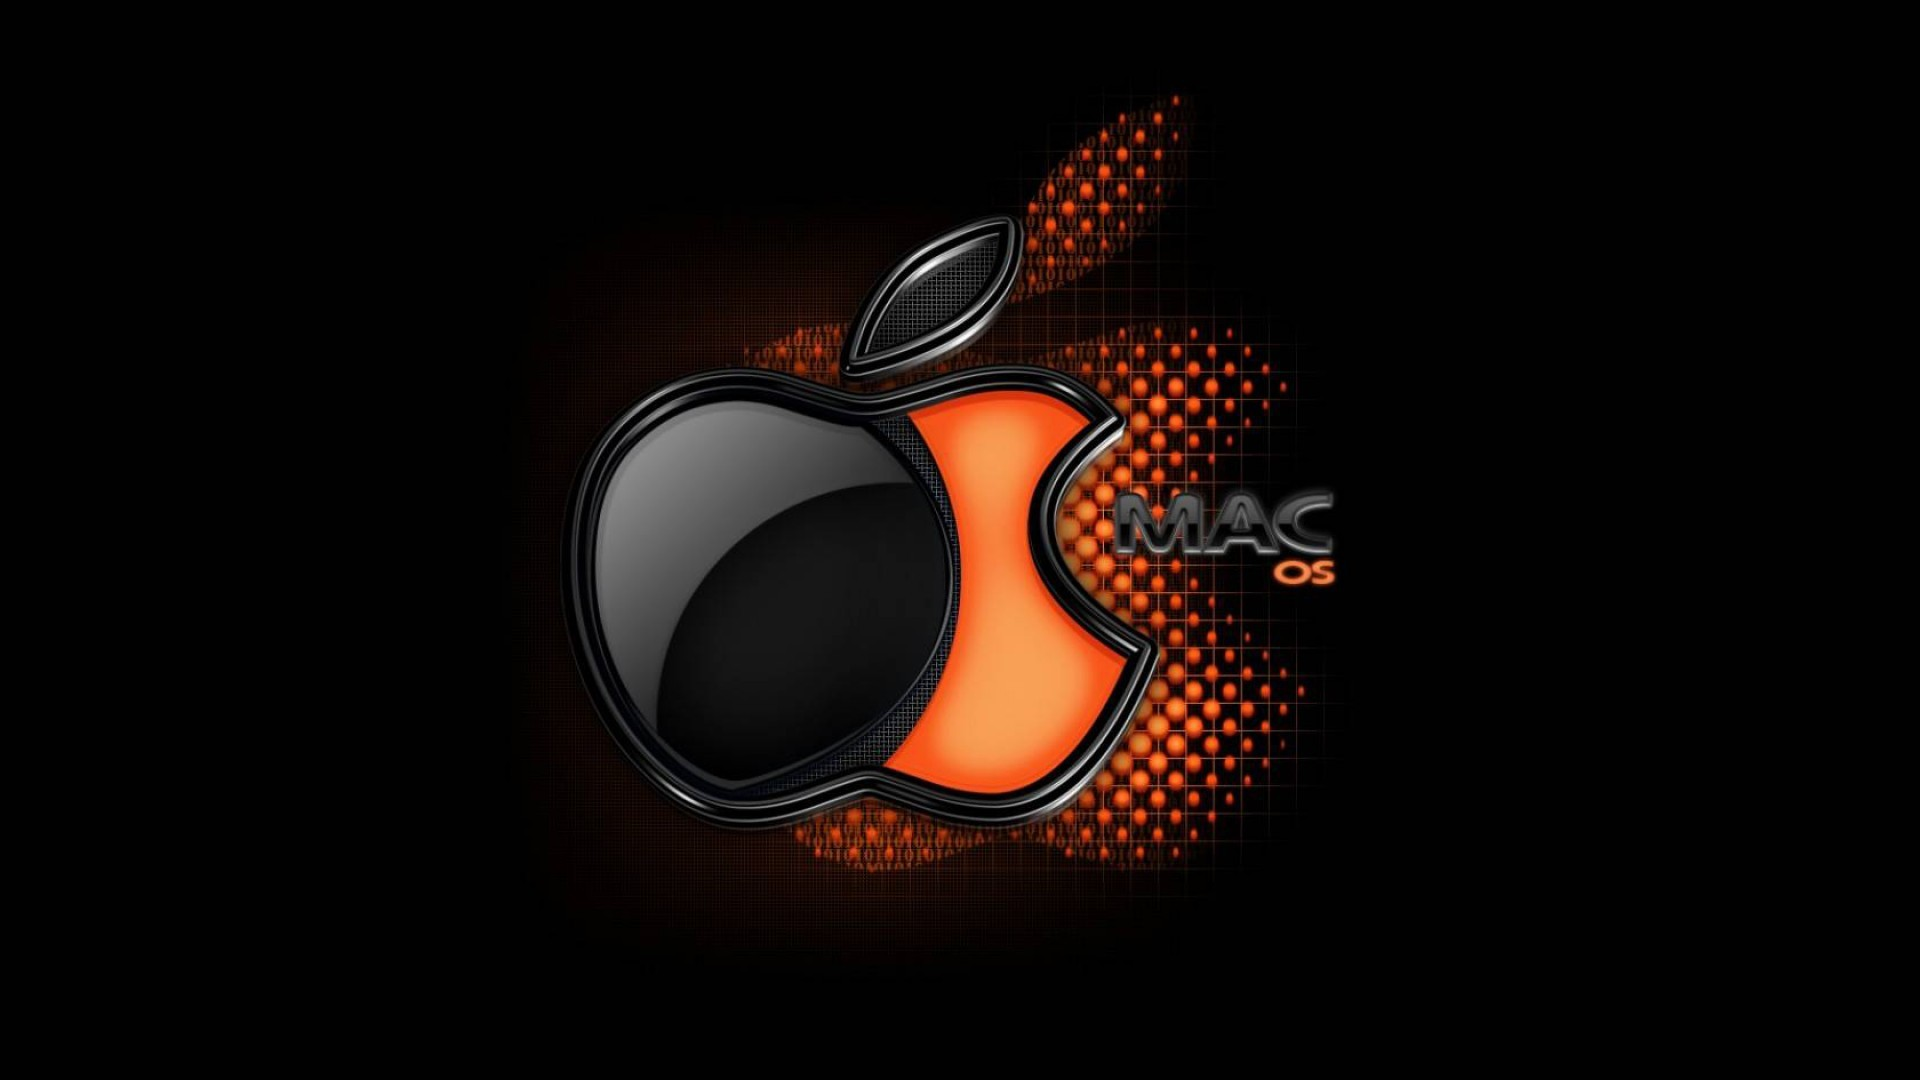 Black And Orange Wallpaper